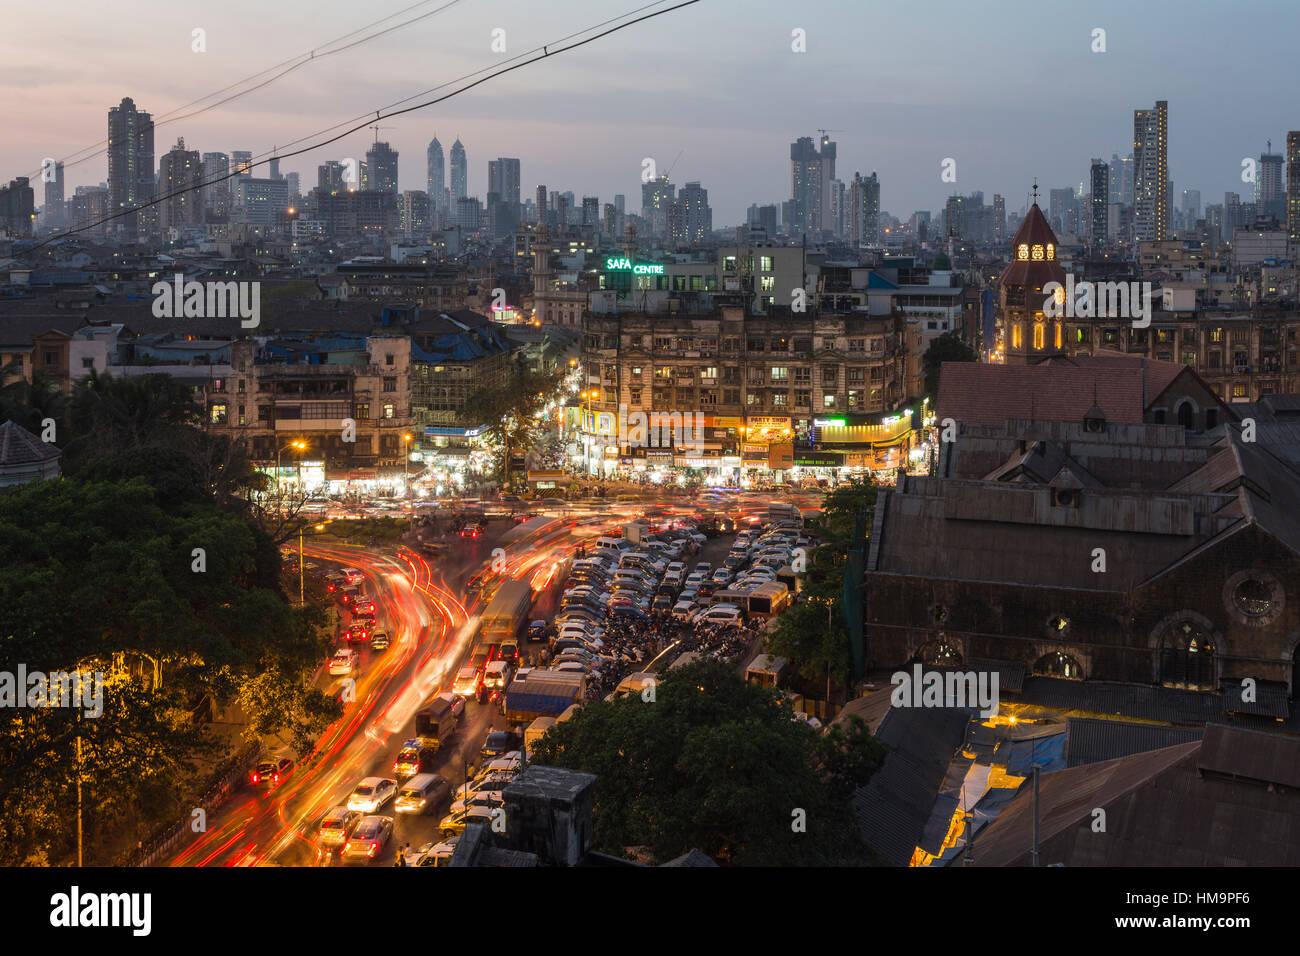 Sera Rush Hour a Crawford mercato, ora chiamato mahatma Jyotiba Phule Market, Skyline, Mumbai, Maharashtra, India Immagini Stock